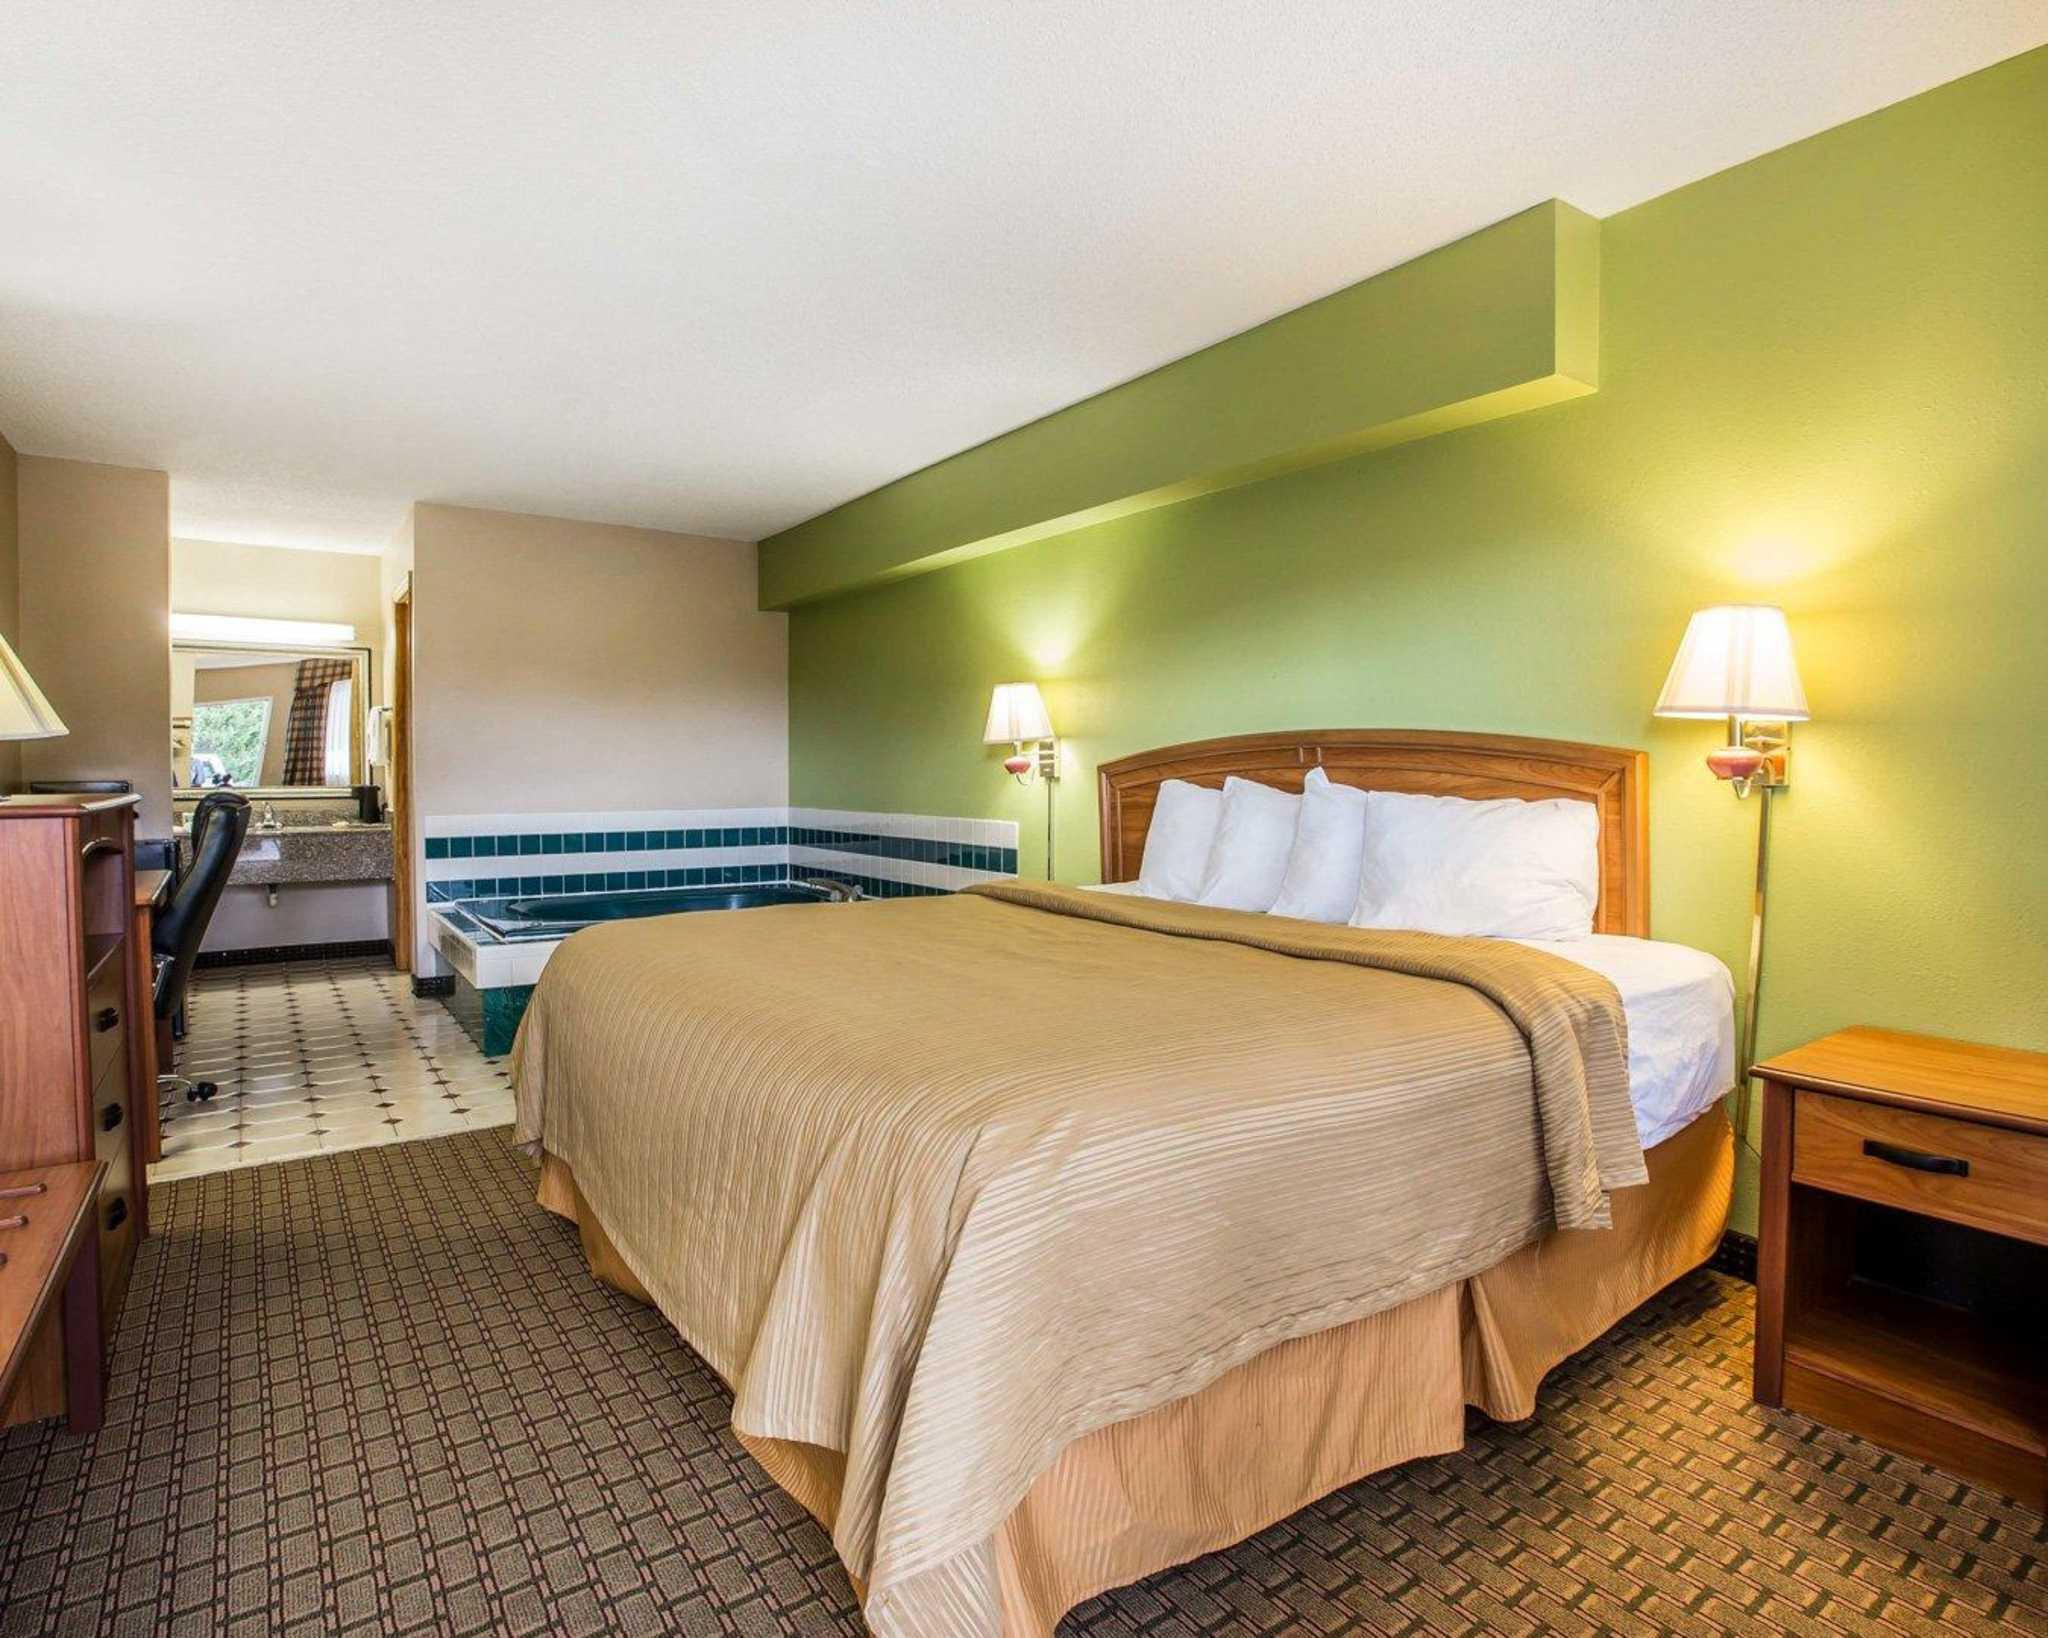 Quality Inn & Suites Dublin image 6